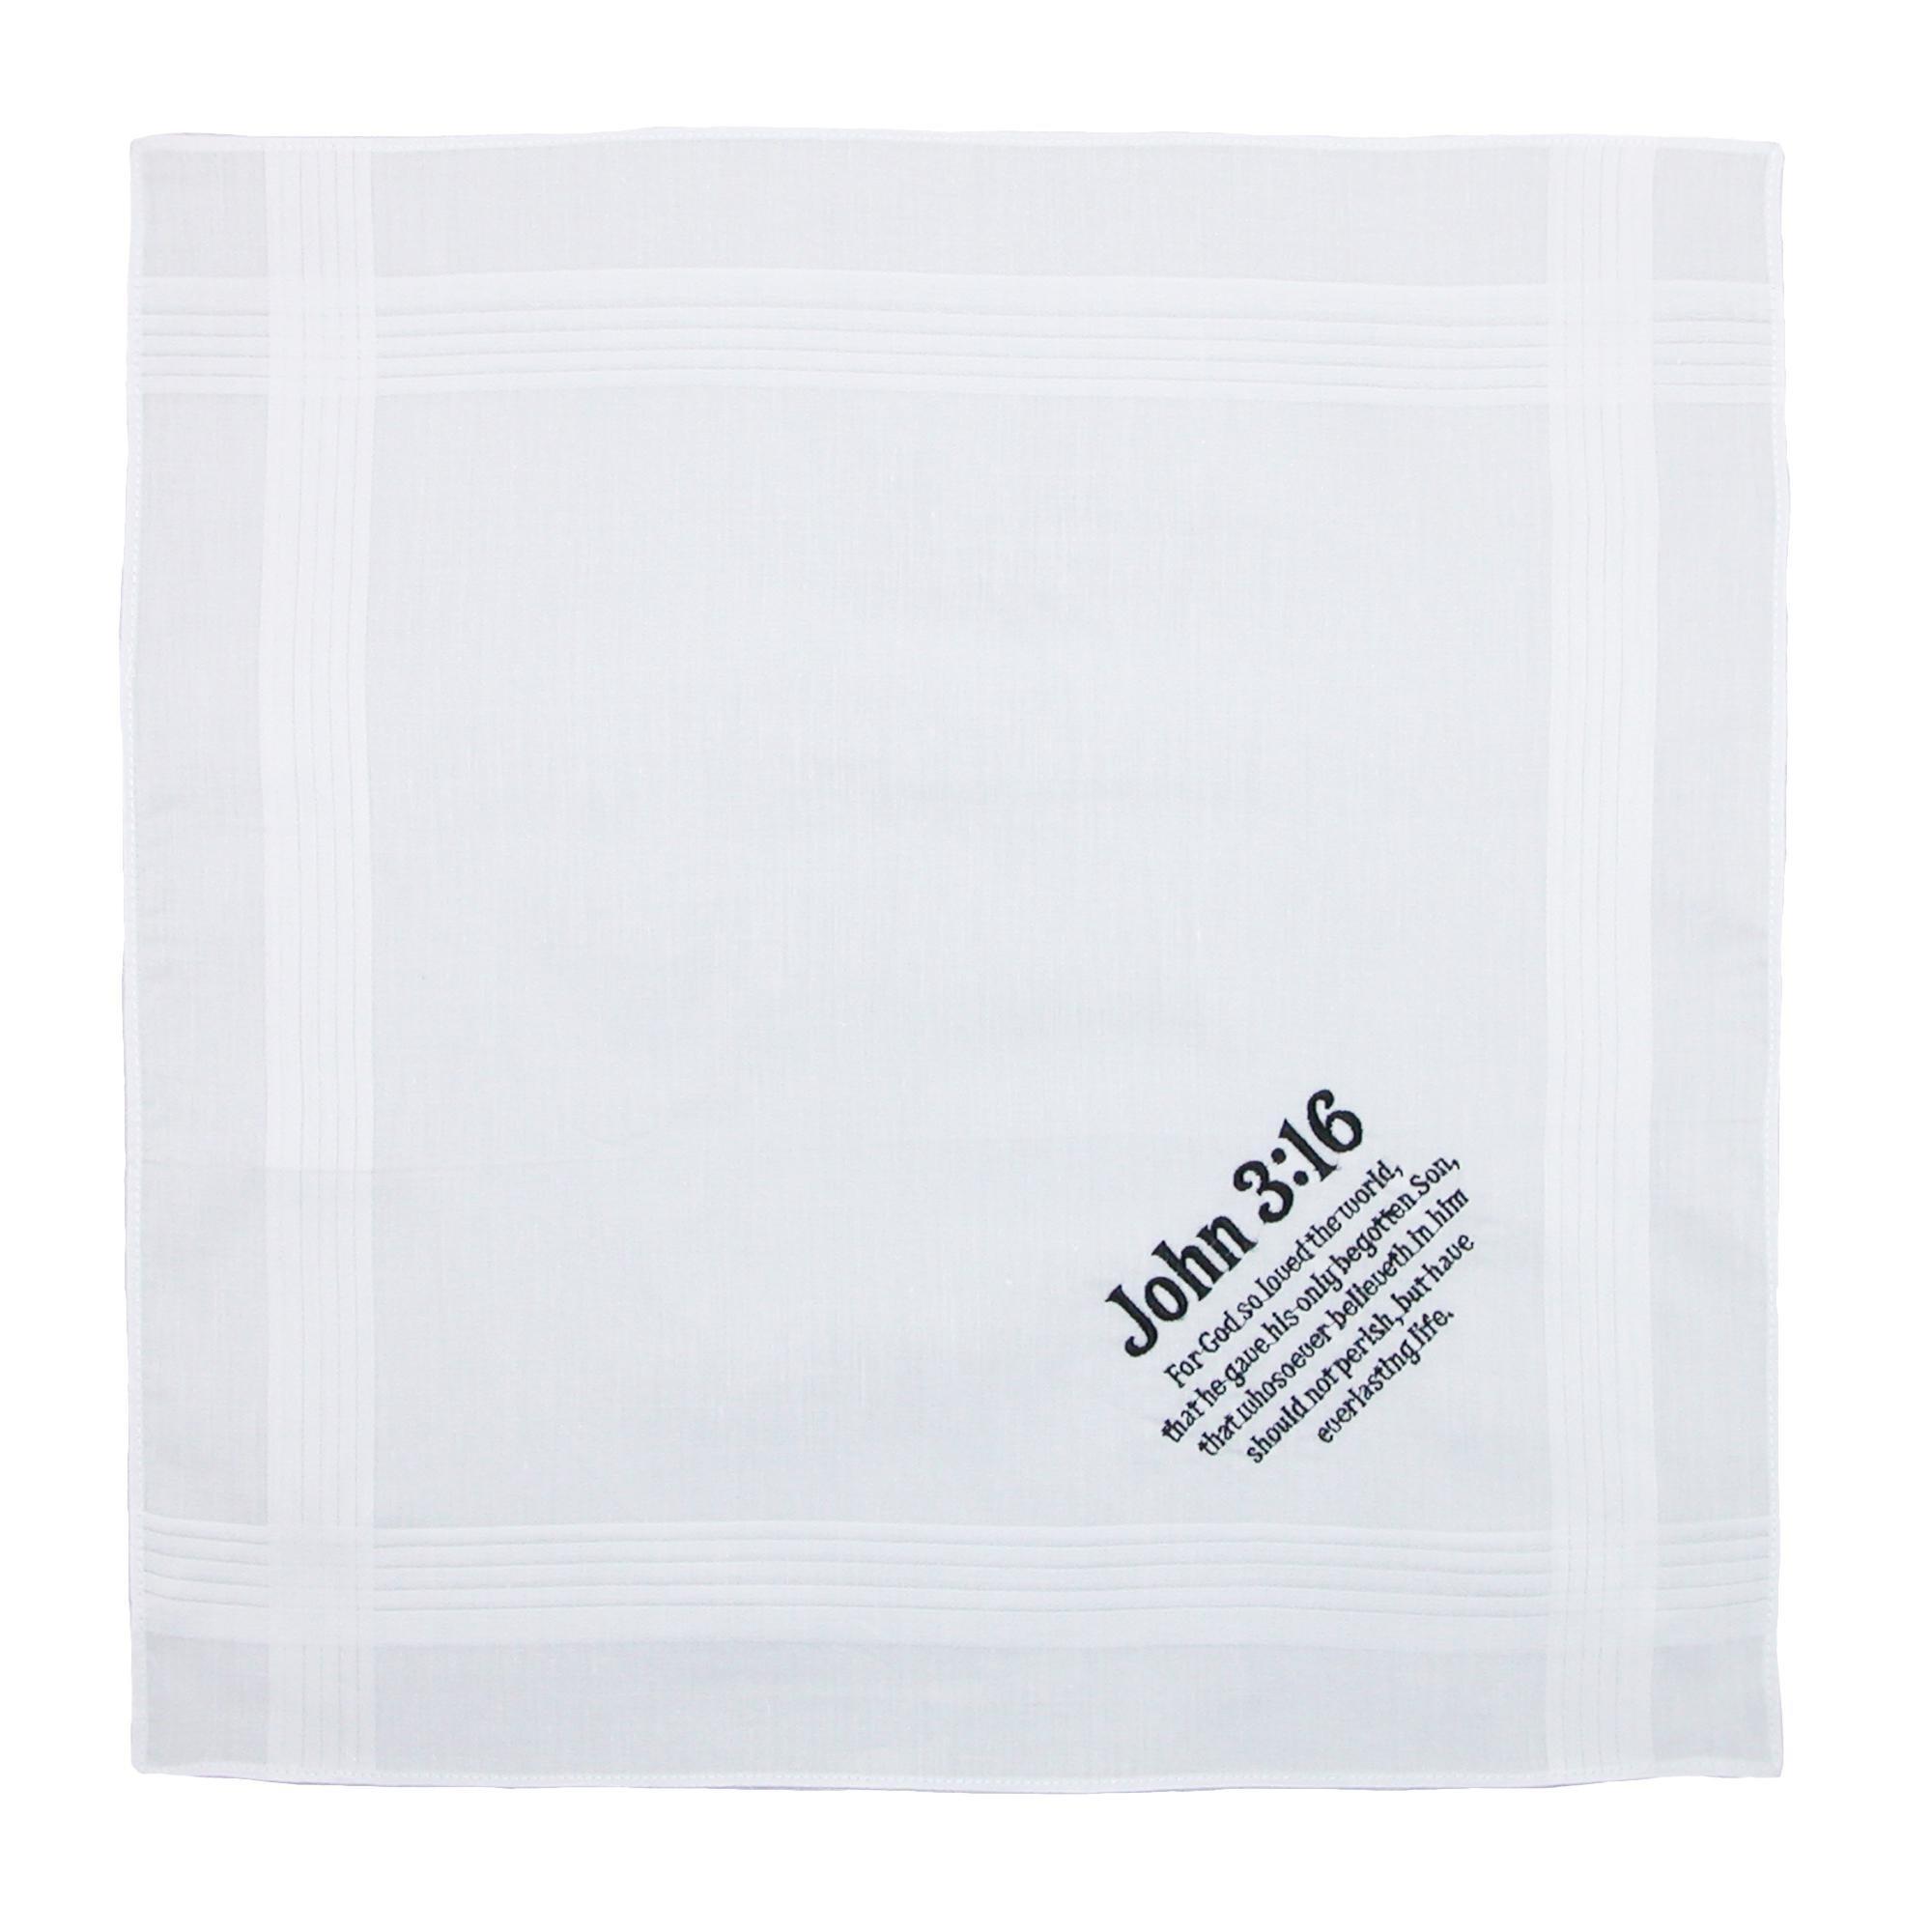 Umo Lorenzo Cotton John 3:16 Embroidered Handkerchief Set (Pack of 6), White by Umo Lorenzo (Image #3)